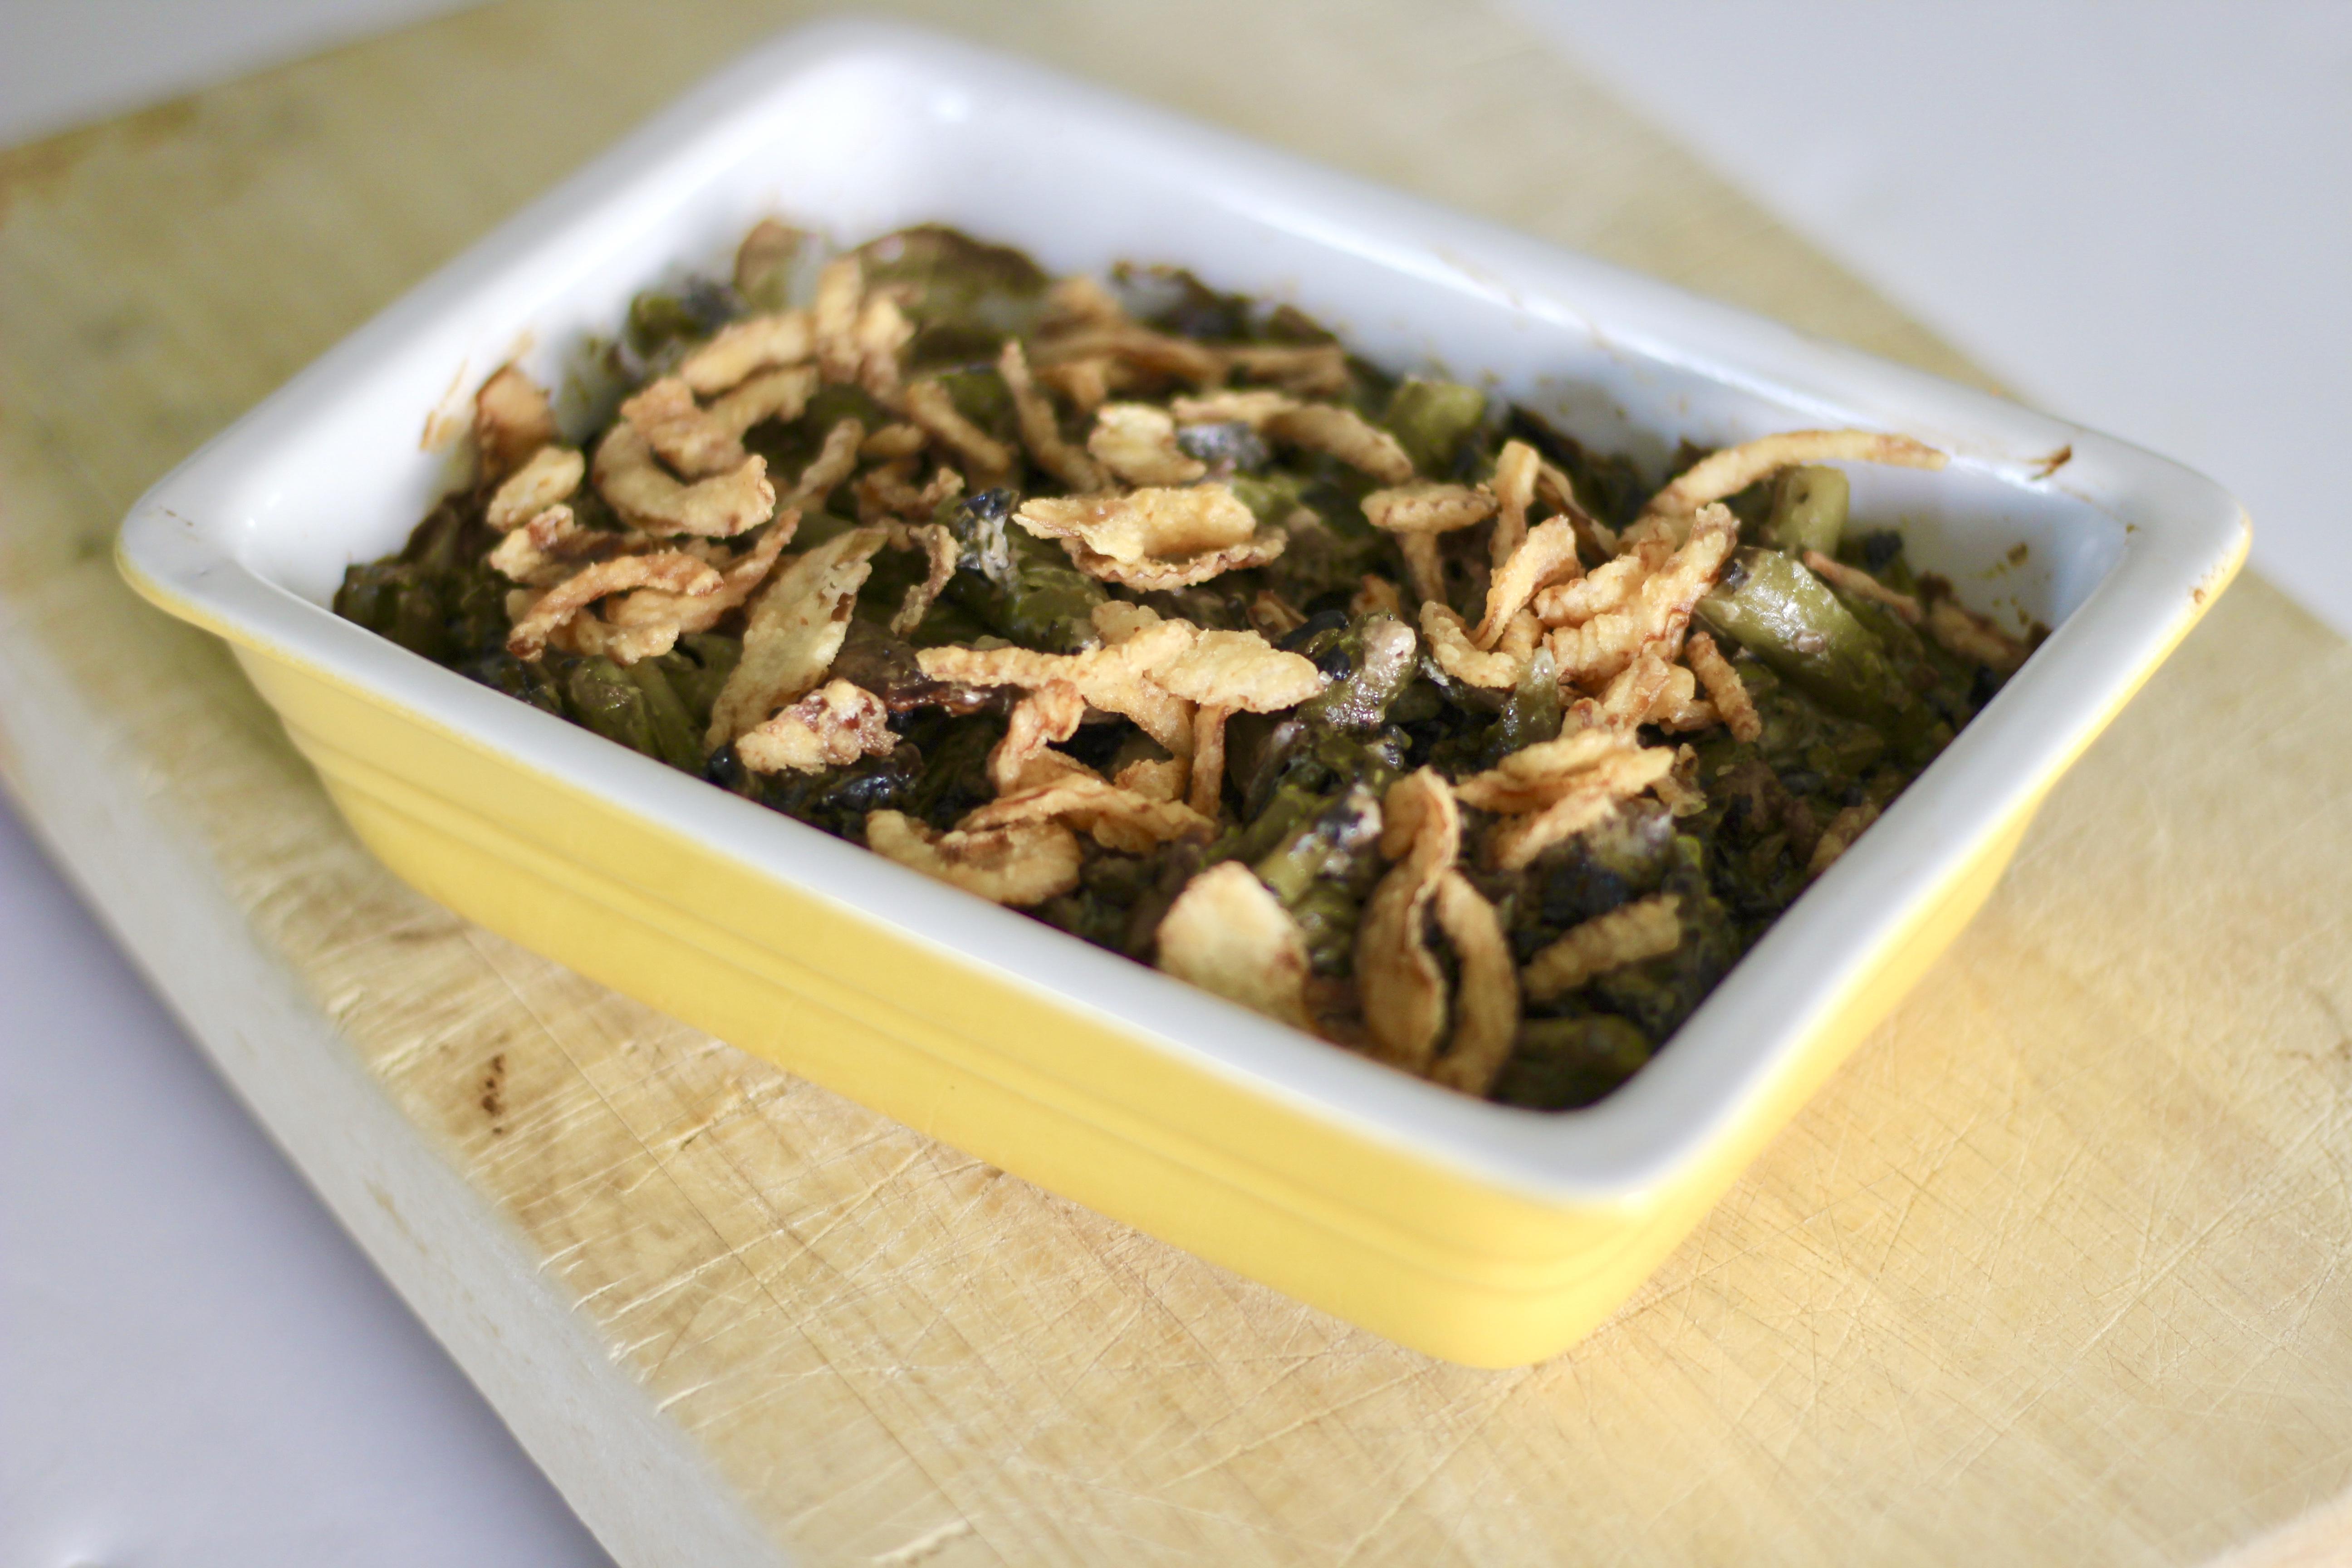 Lighter Green Bean and Portobello Mushroom Casserole